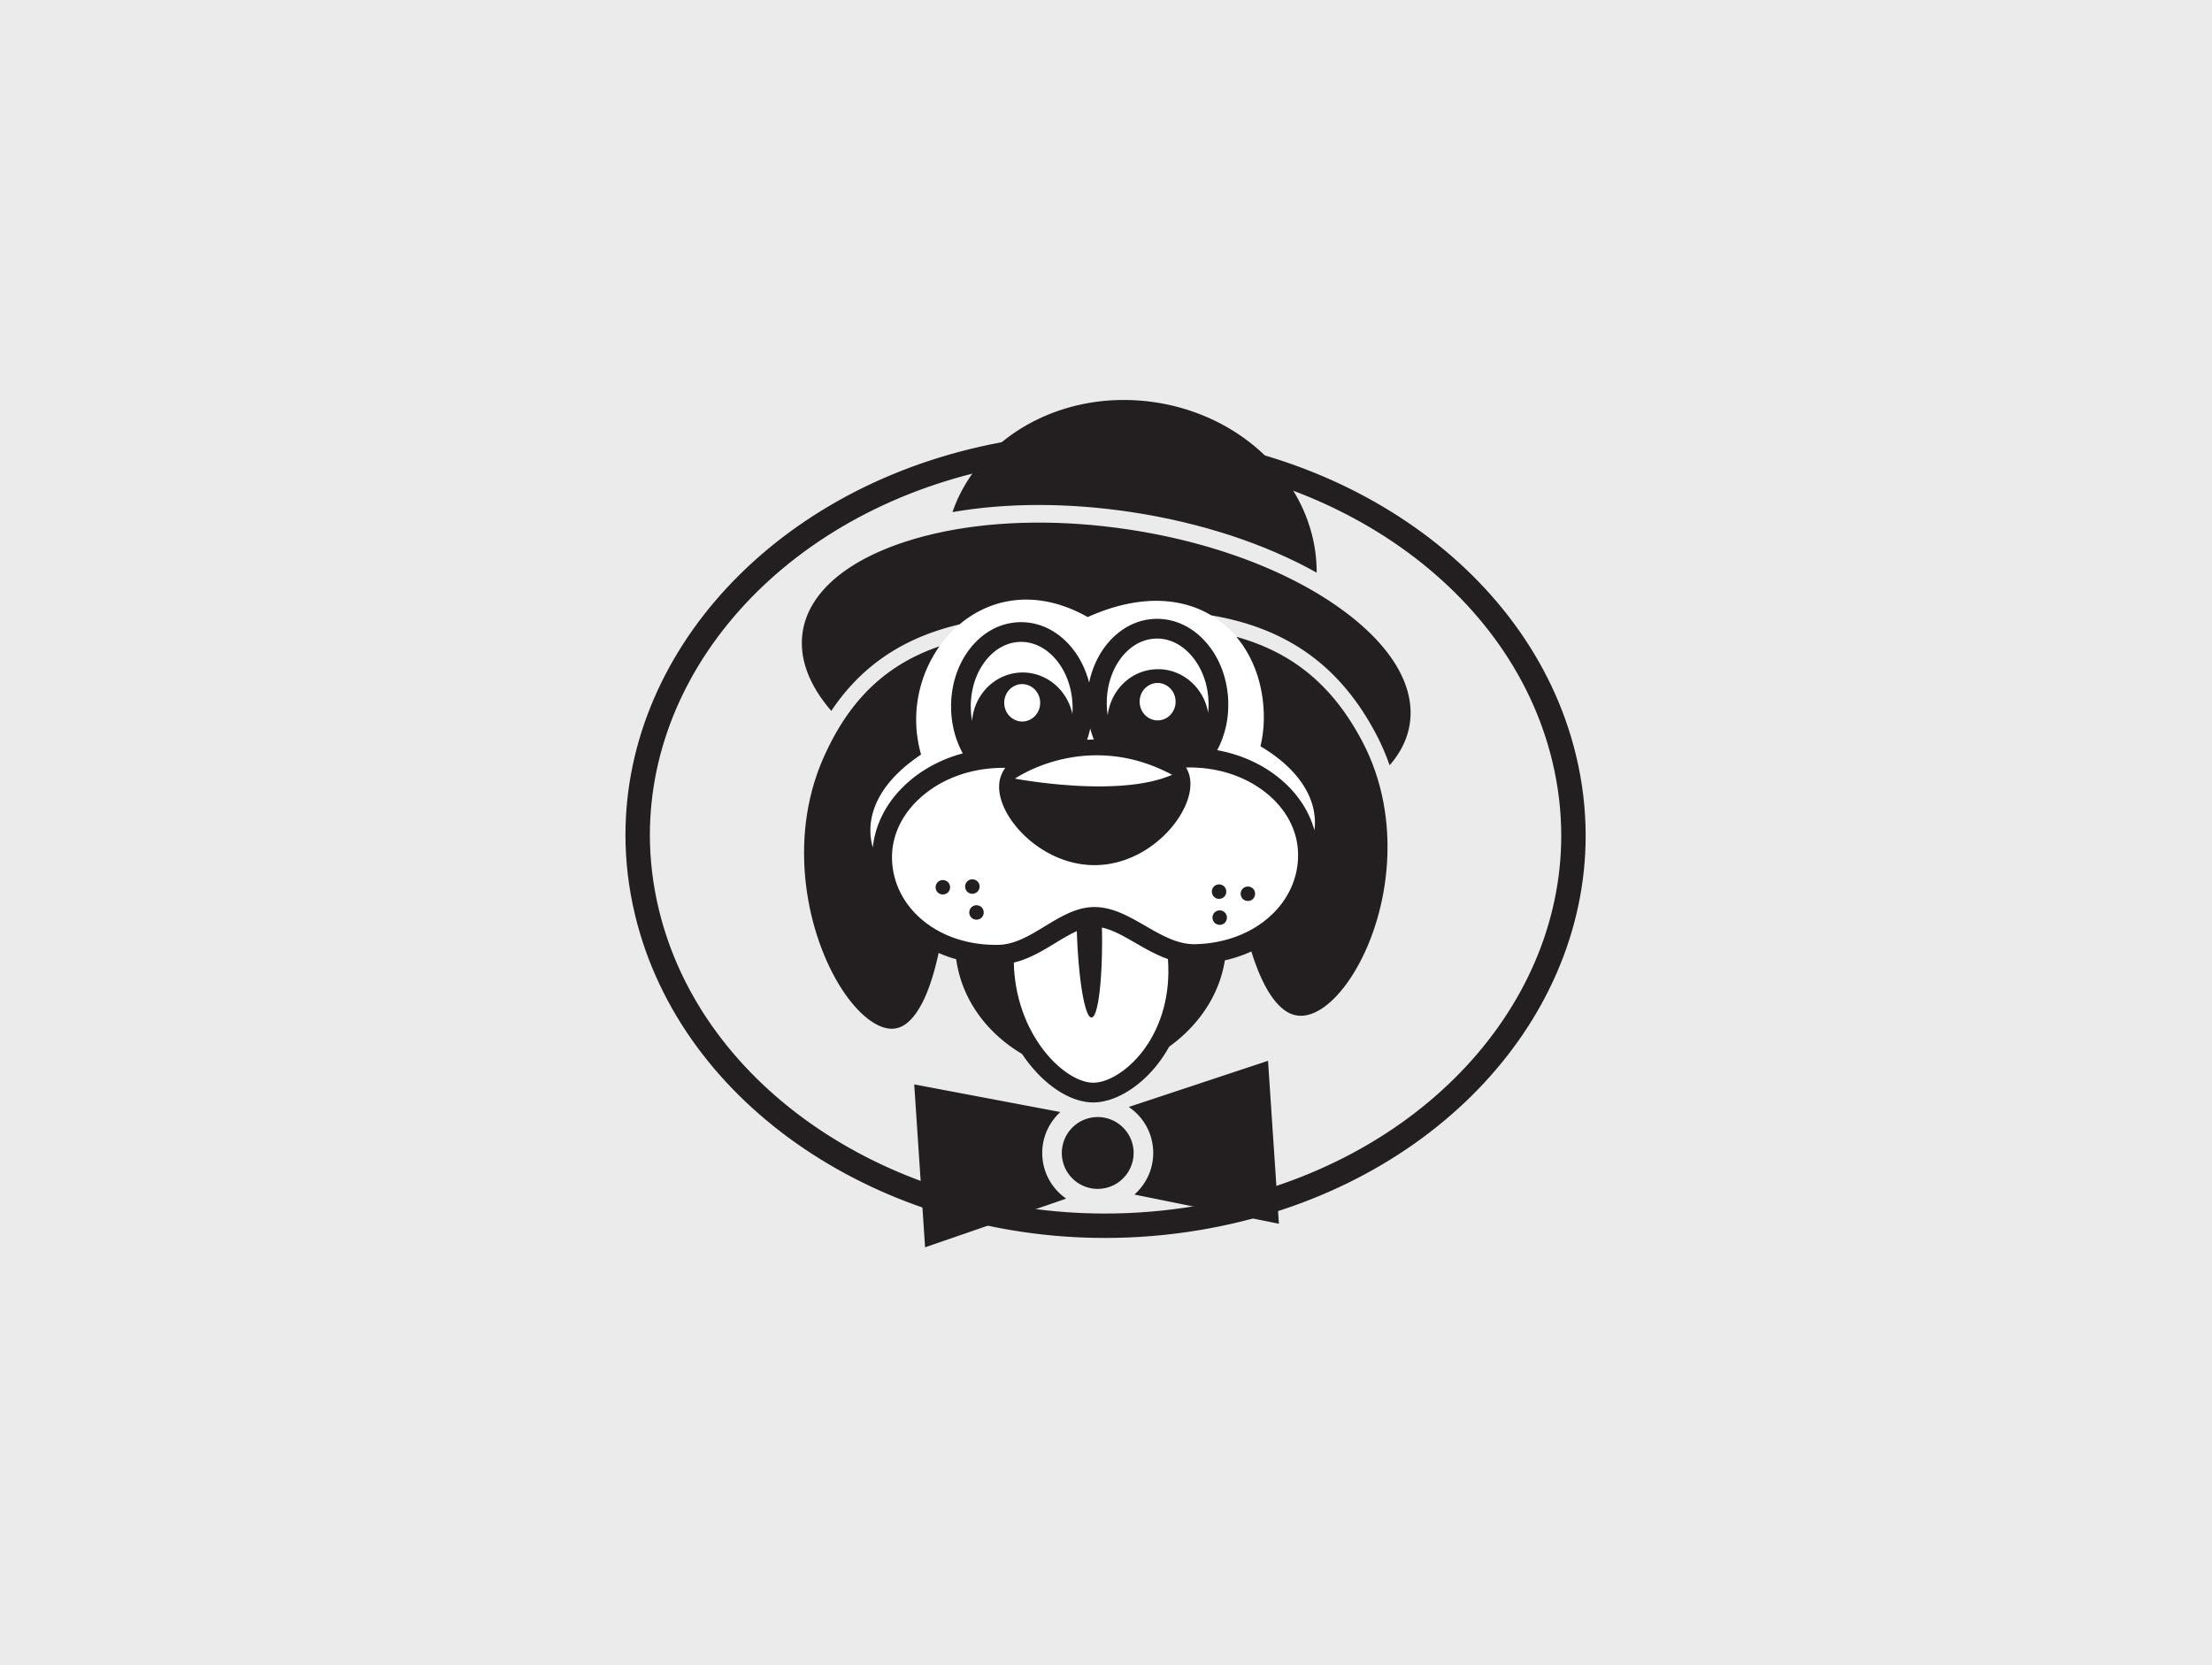 dog business logo design by mike hosier